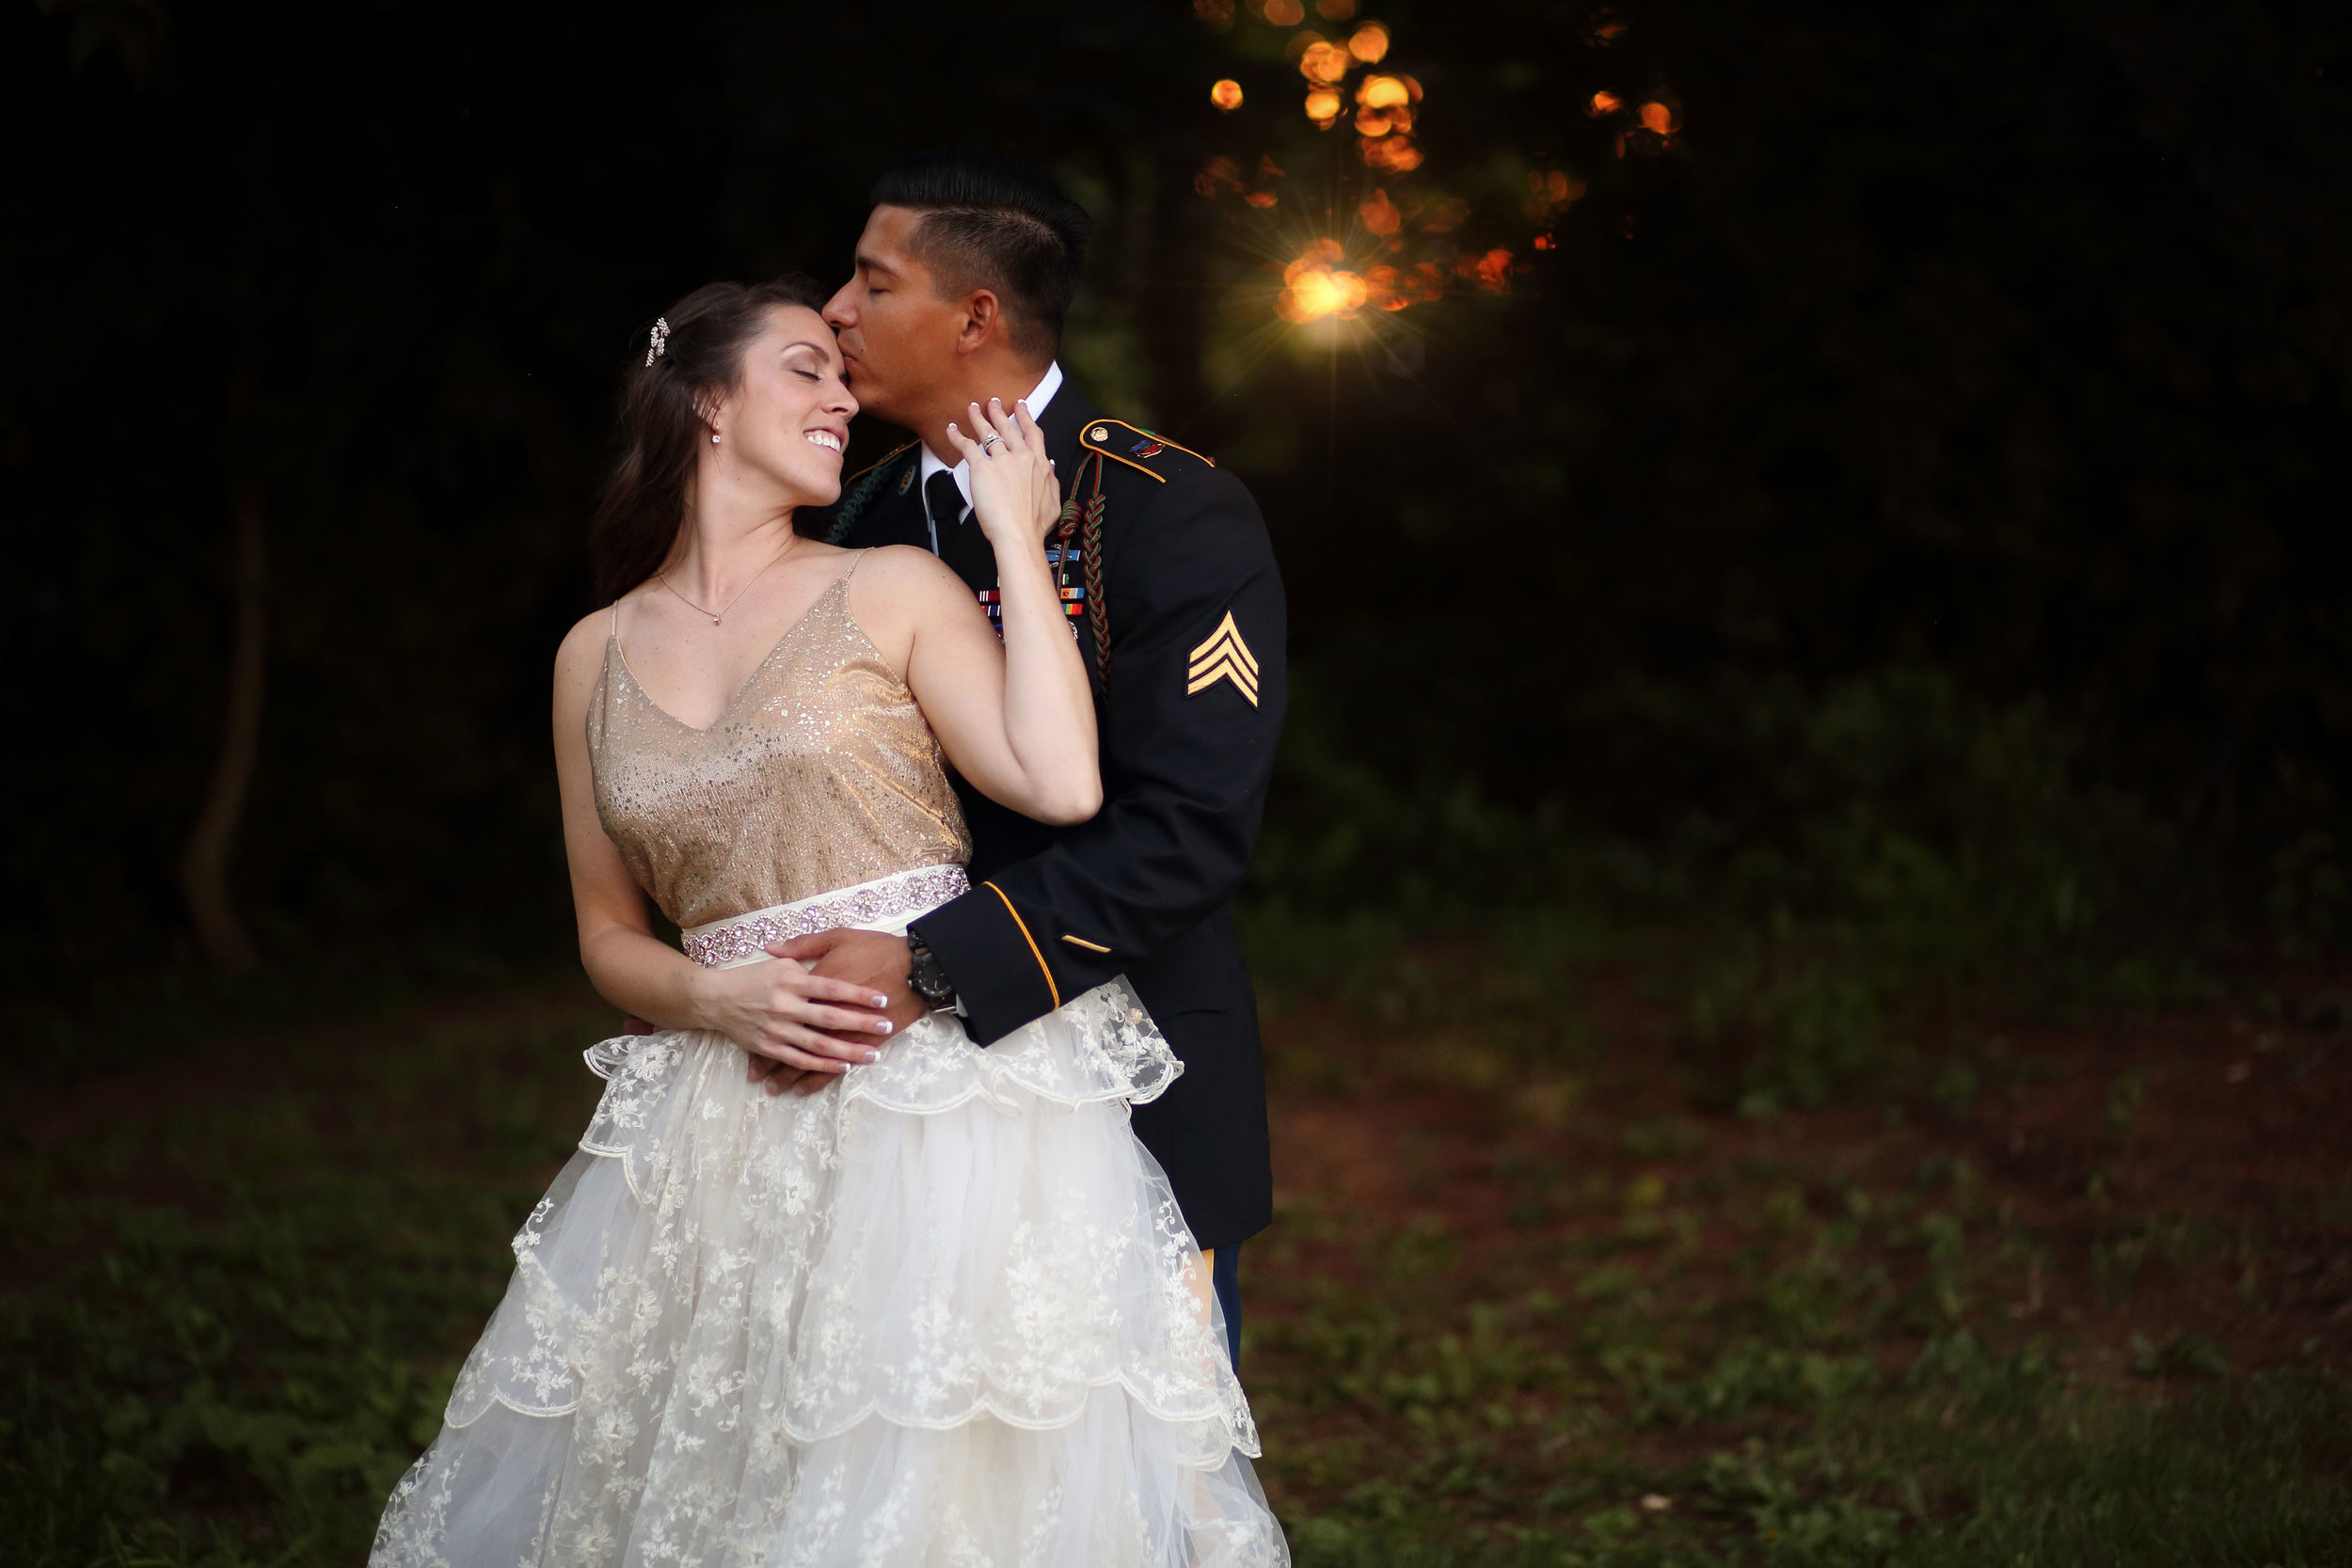 Tamara-Green_Wedding-Photography-6.jpg